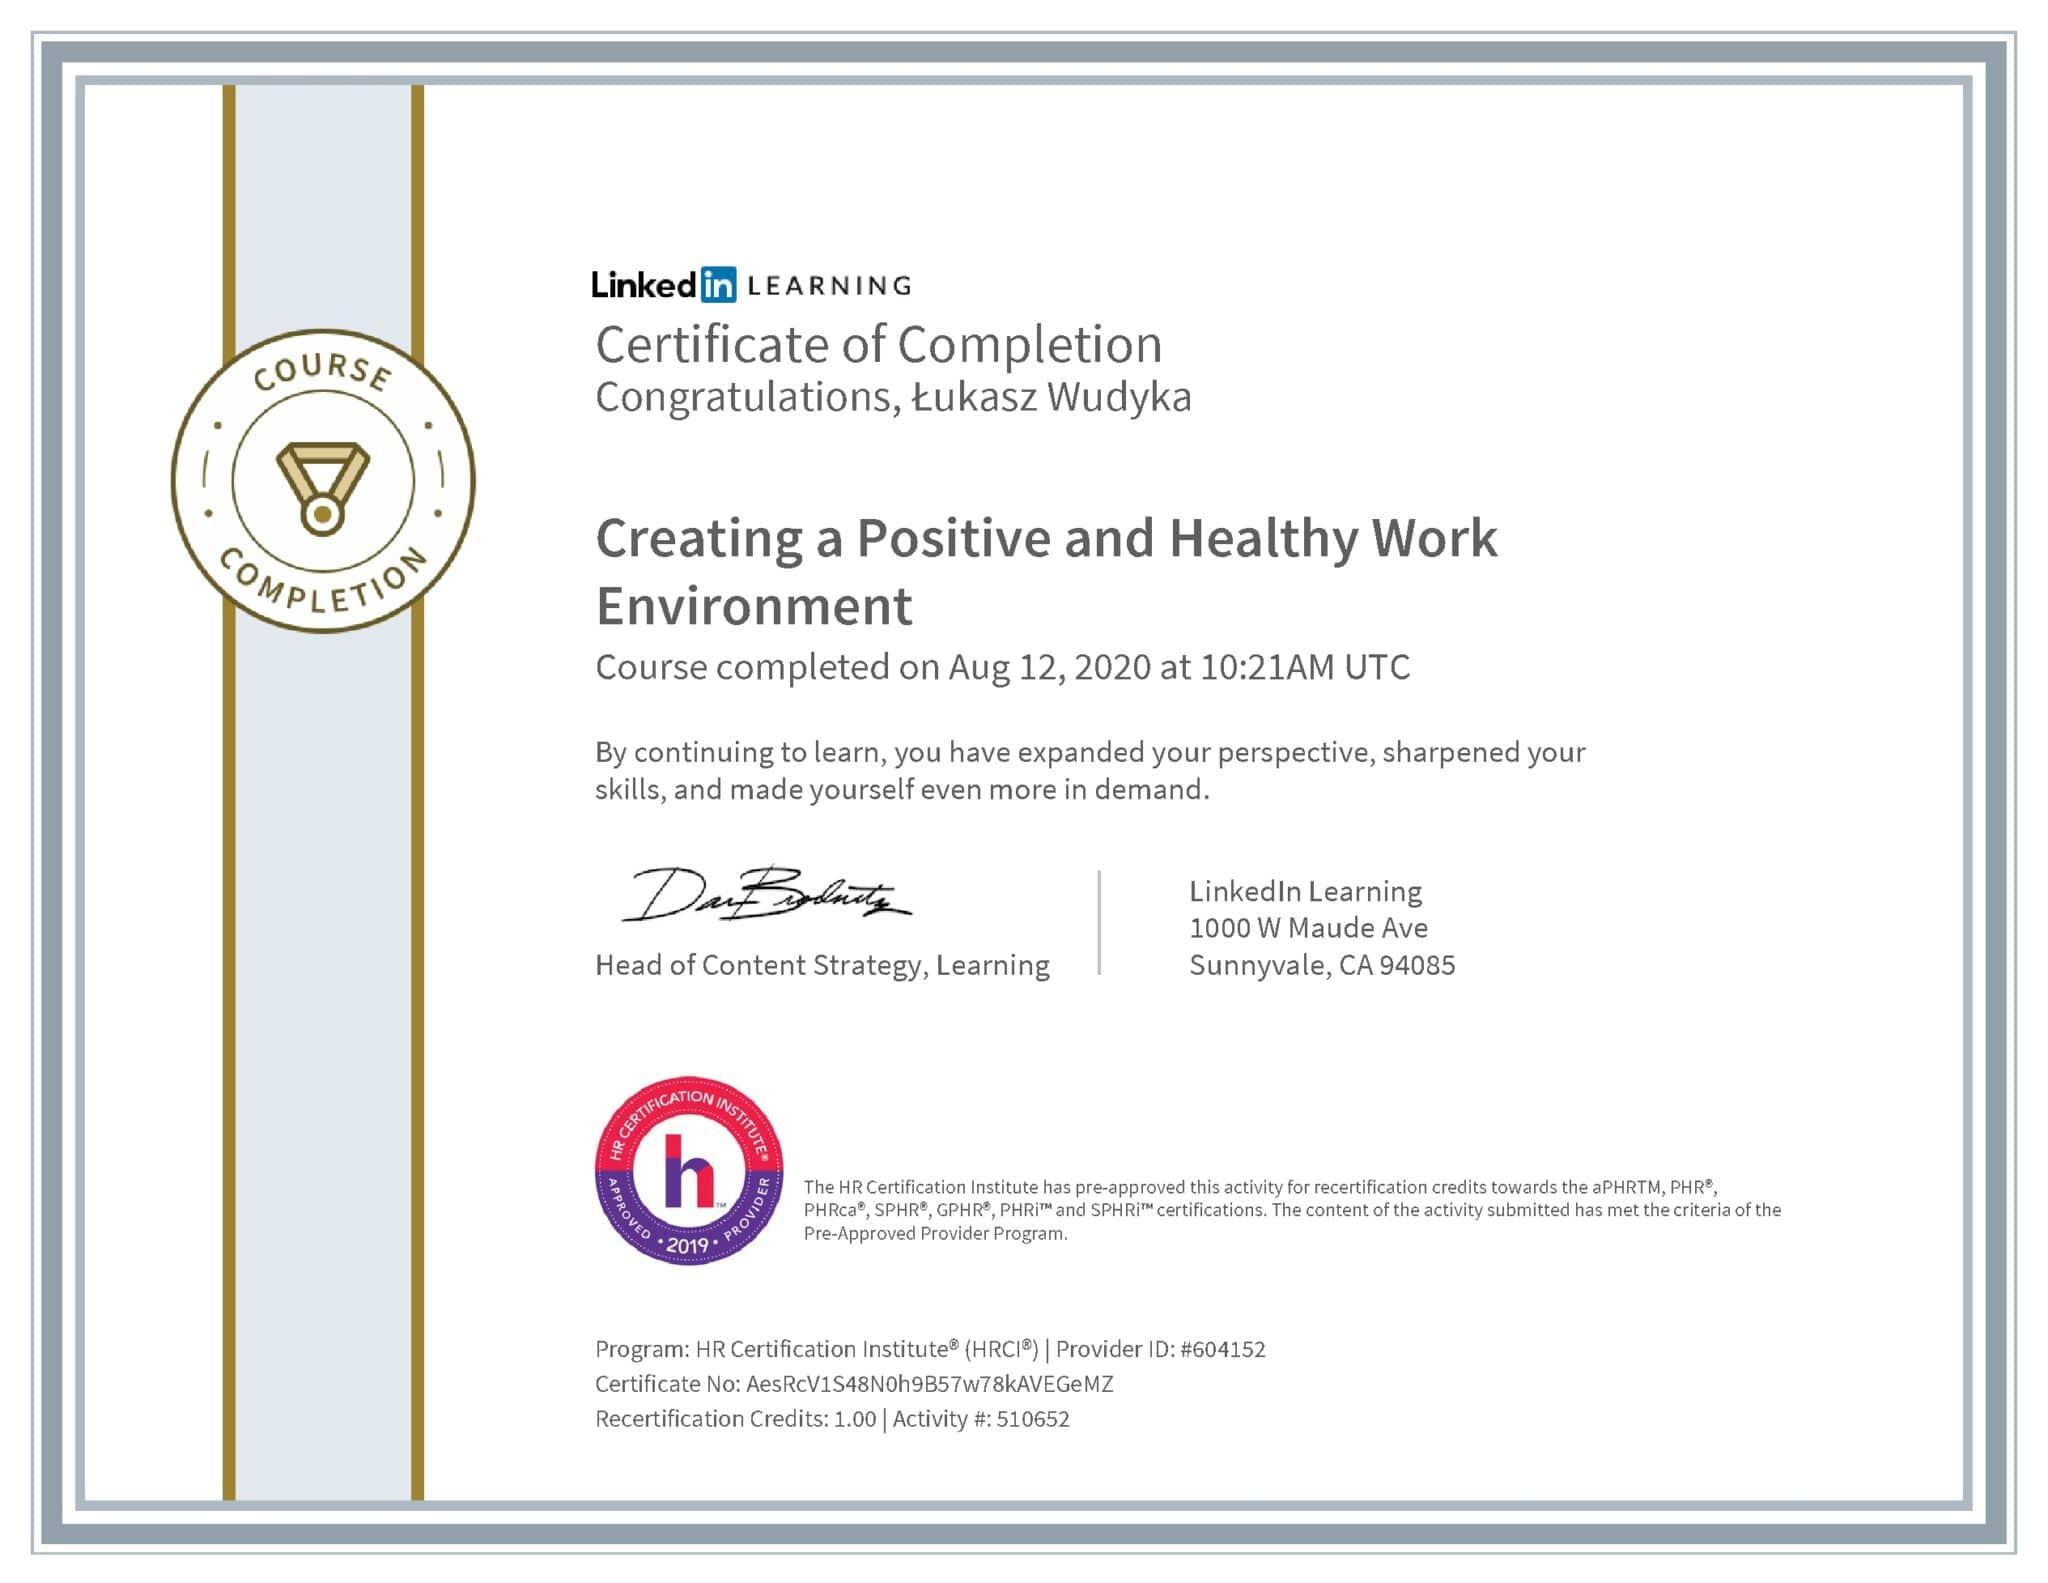 Łukasz Wudyka certyfikat LinkedIn Creating a Positive and Healthy Work Environment HRCI